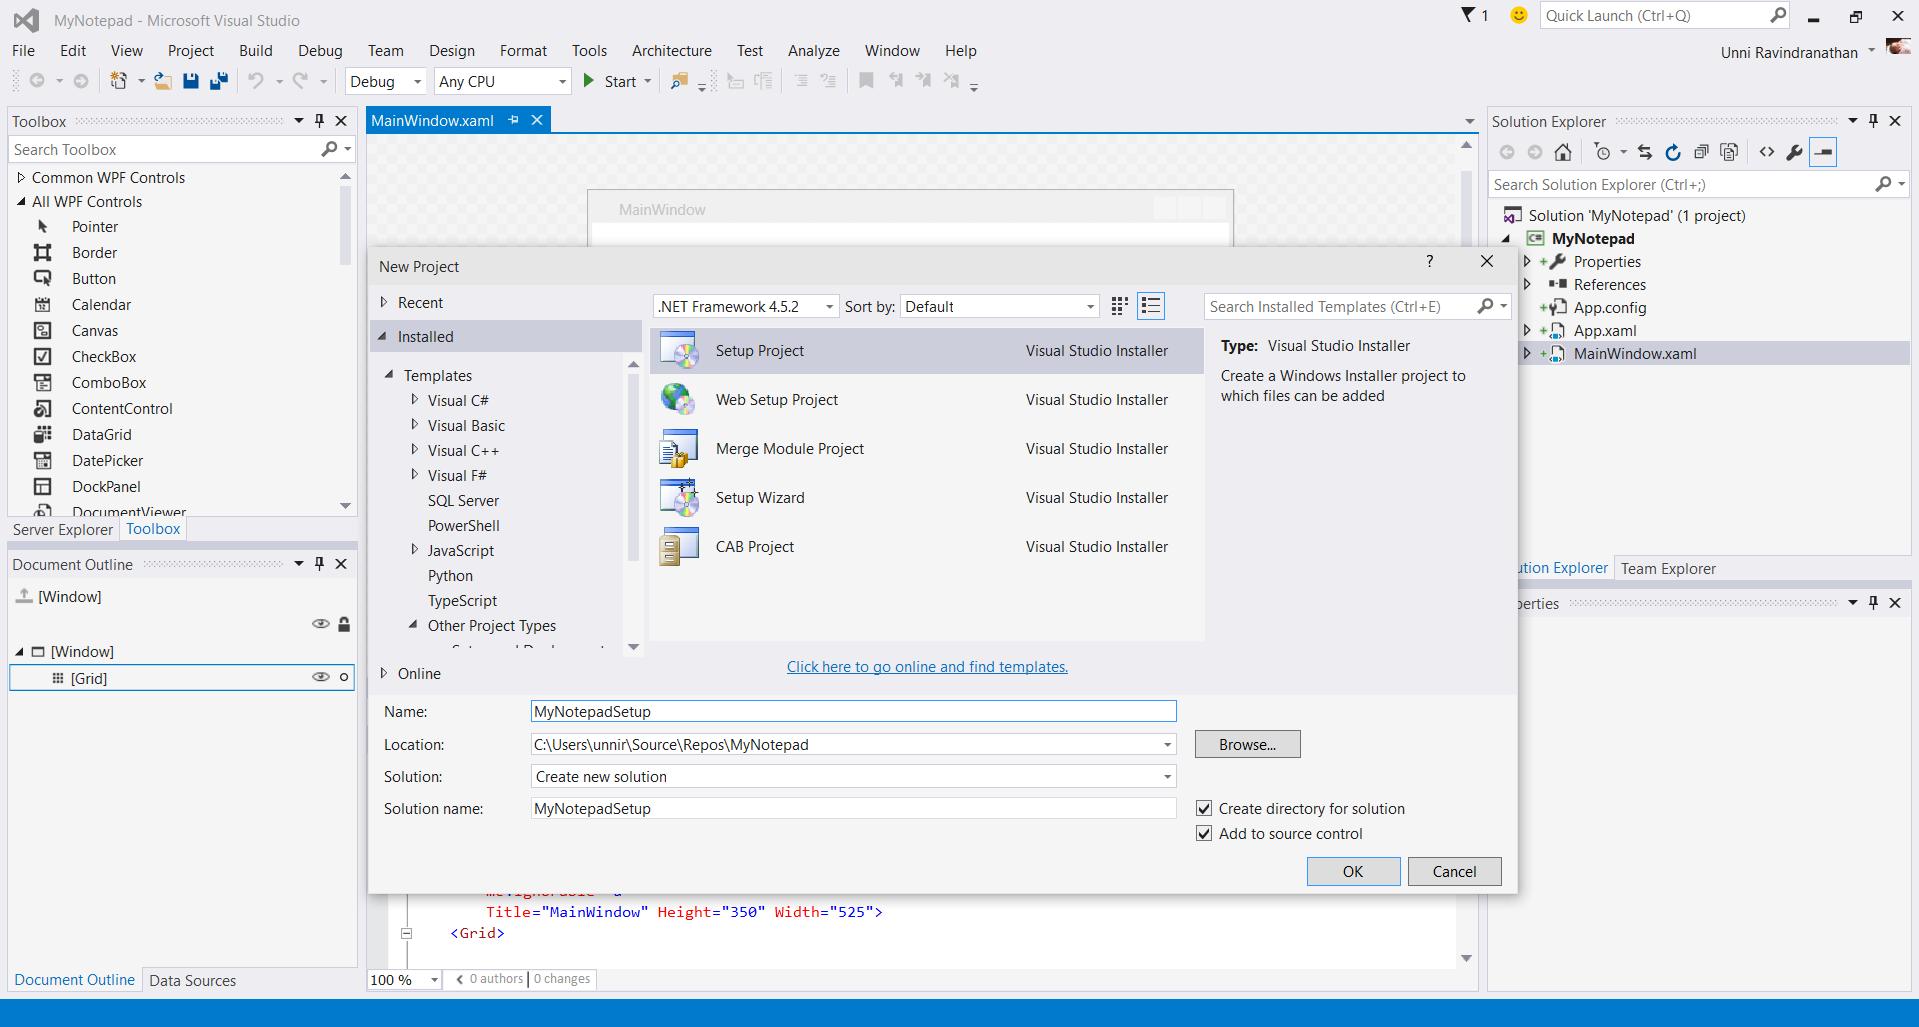 Microsoft Visual Studio 2015 Installer Projects - Visual Studio Marketplace